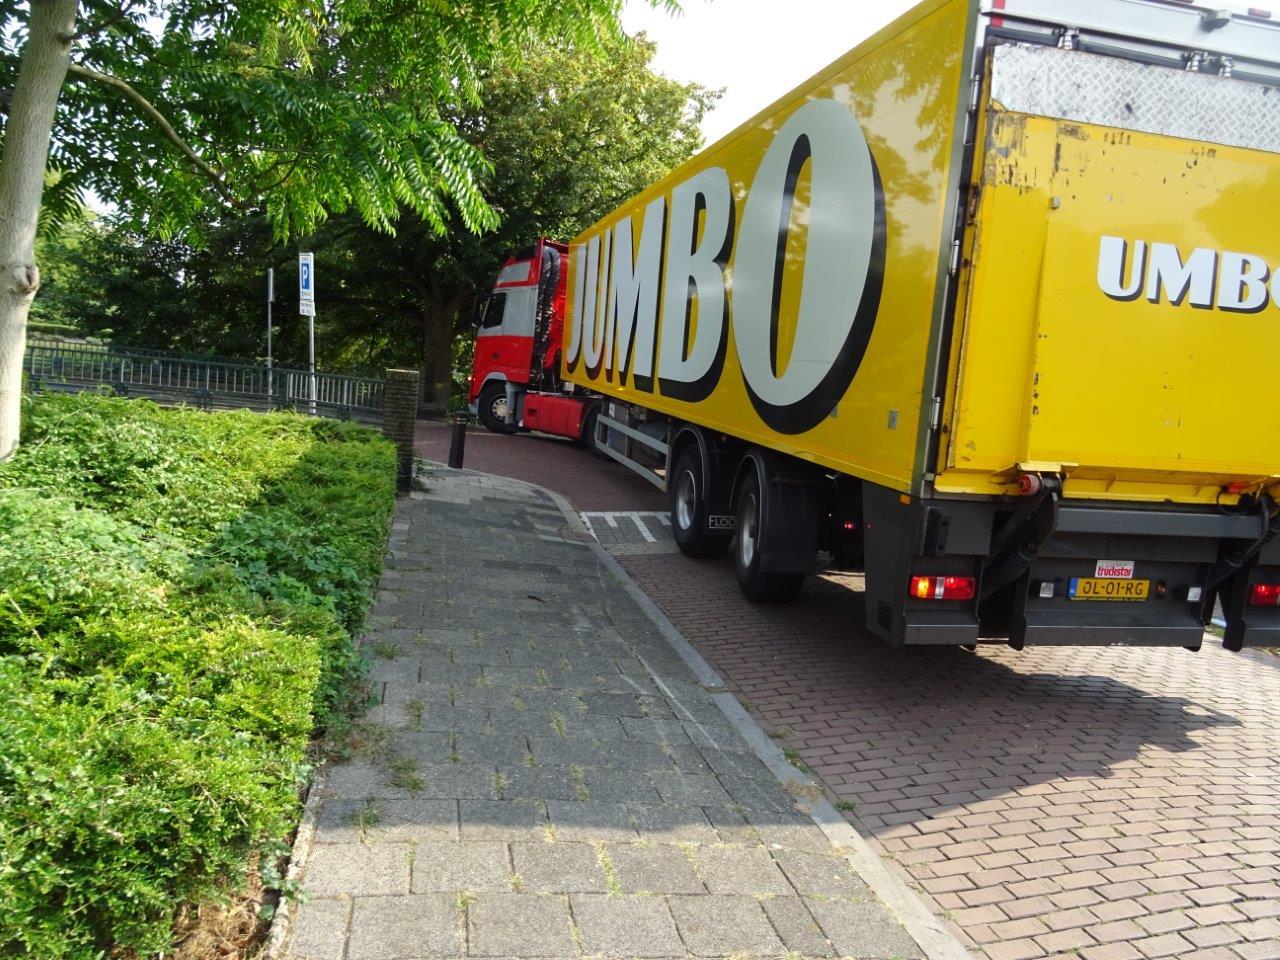 Jumbo 1 DSC07281